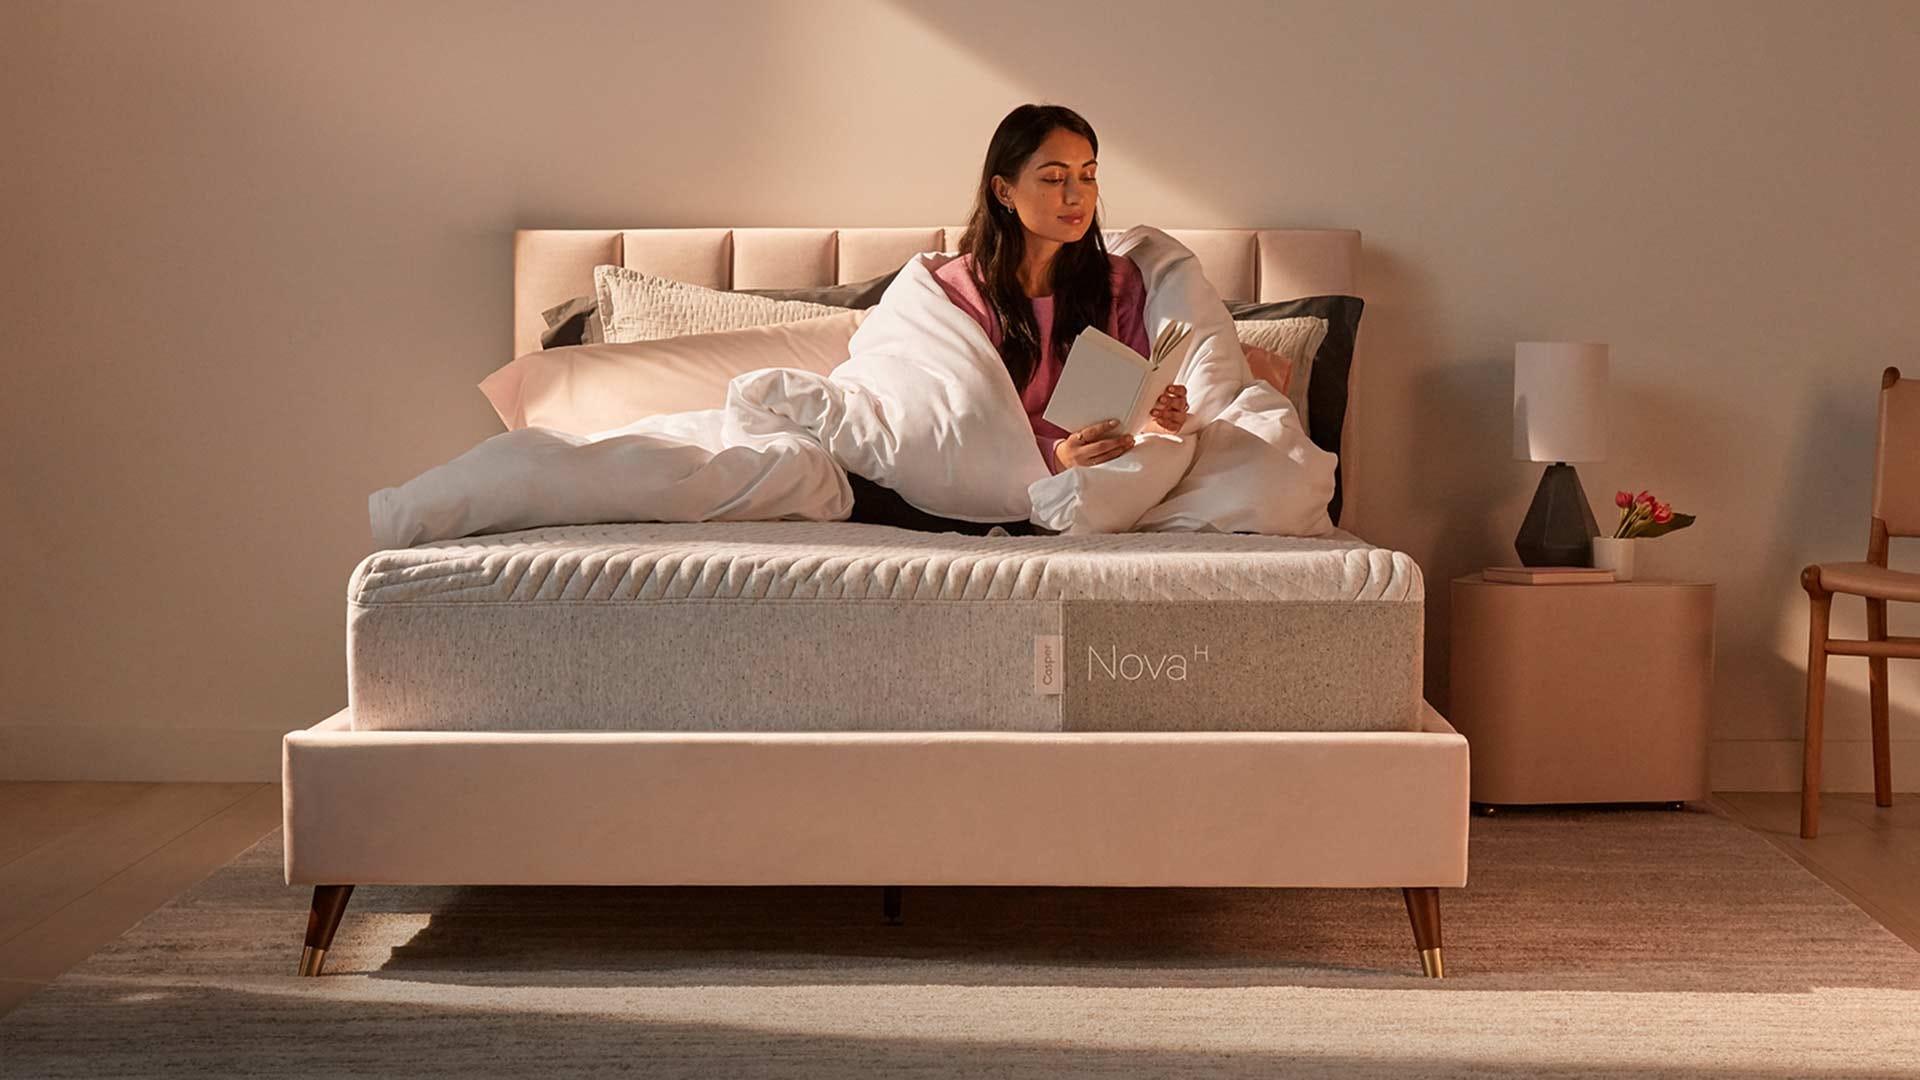 A woman sitting on a Casper hybrid mattress.